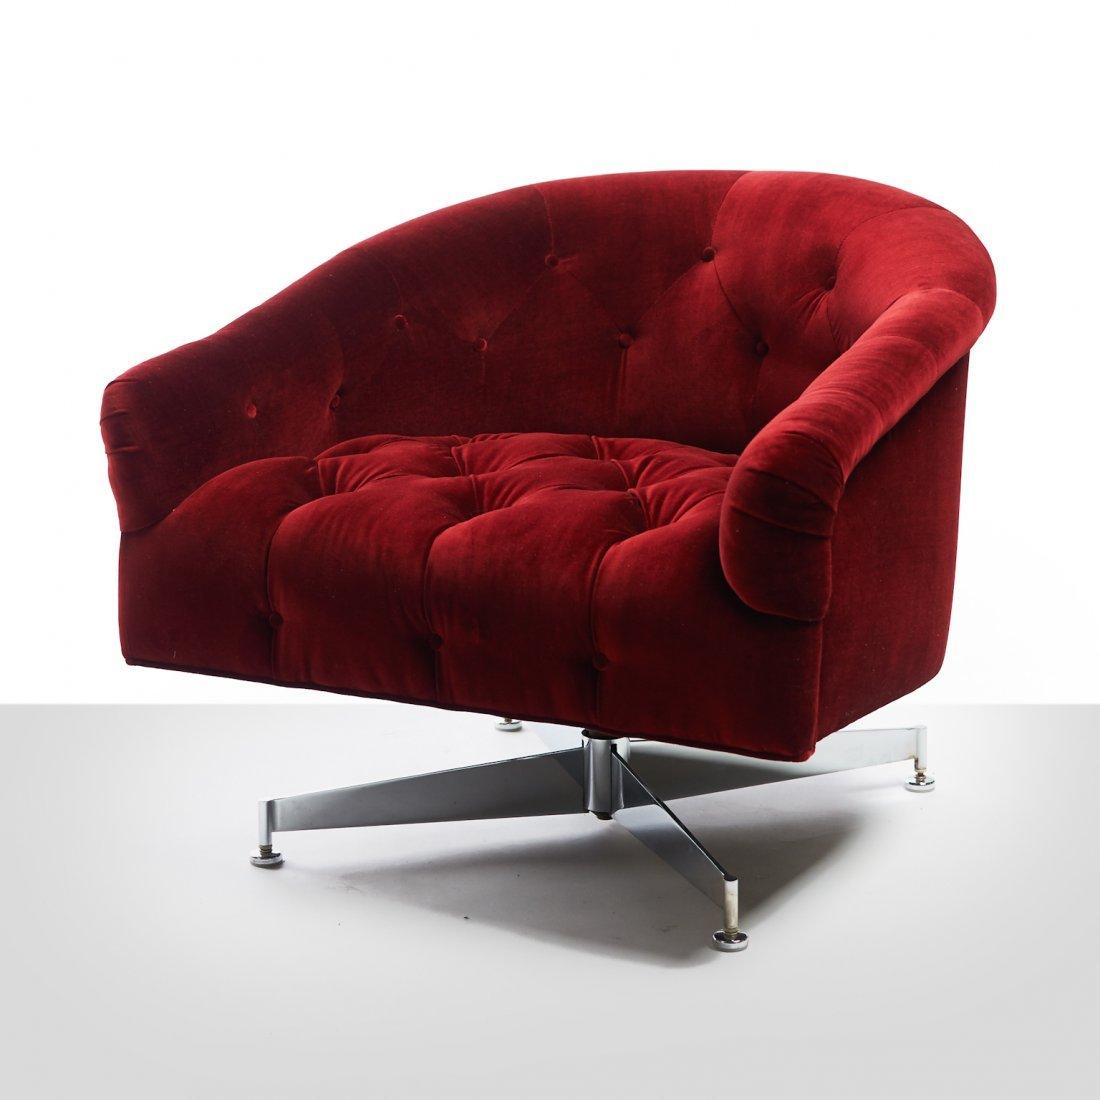 Ward Bennet, Lounge Chair